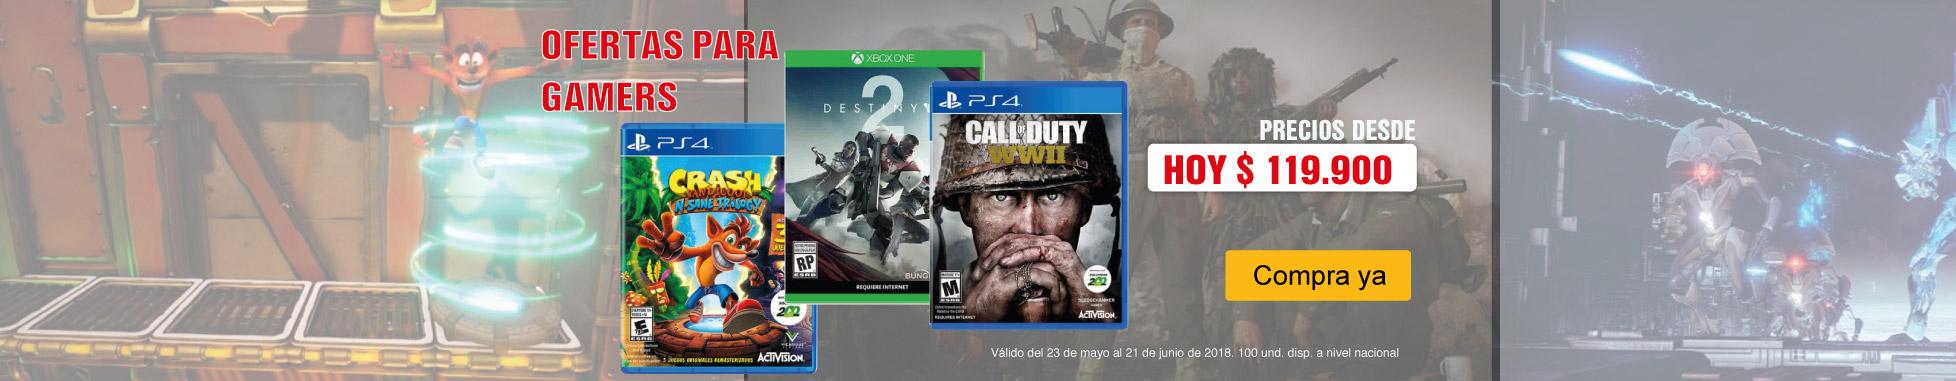 AK-KT-BCAT-9-videojuegos-PP---Videojuegos-varios-May23